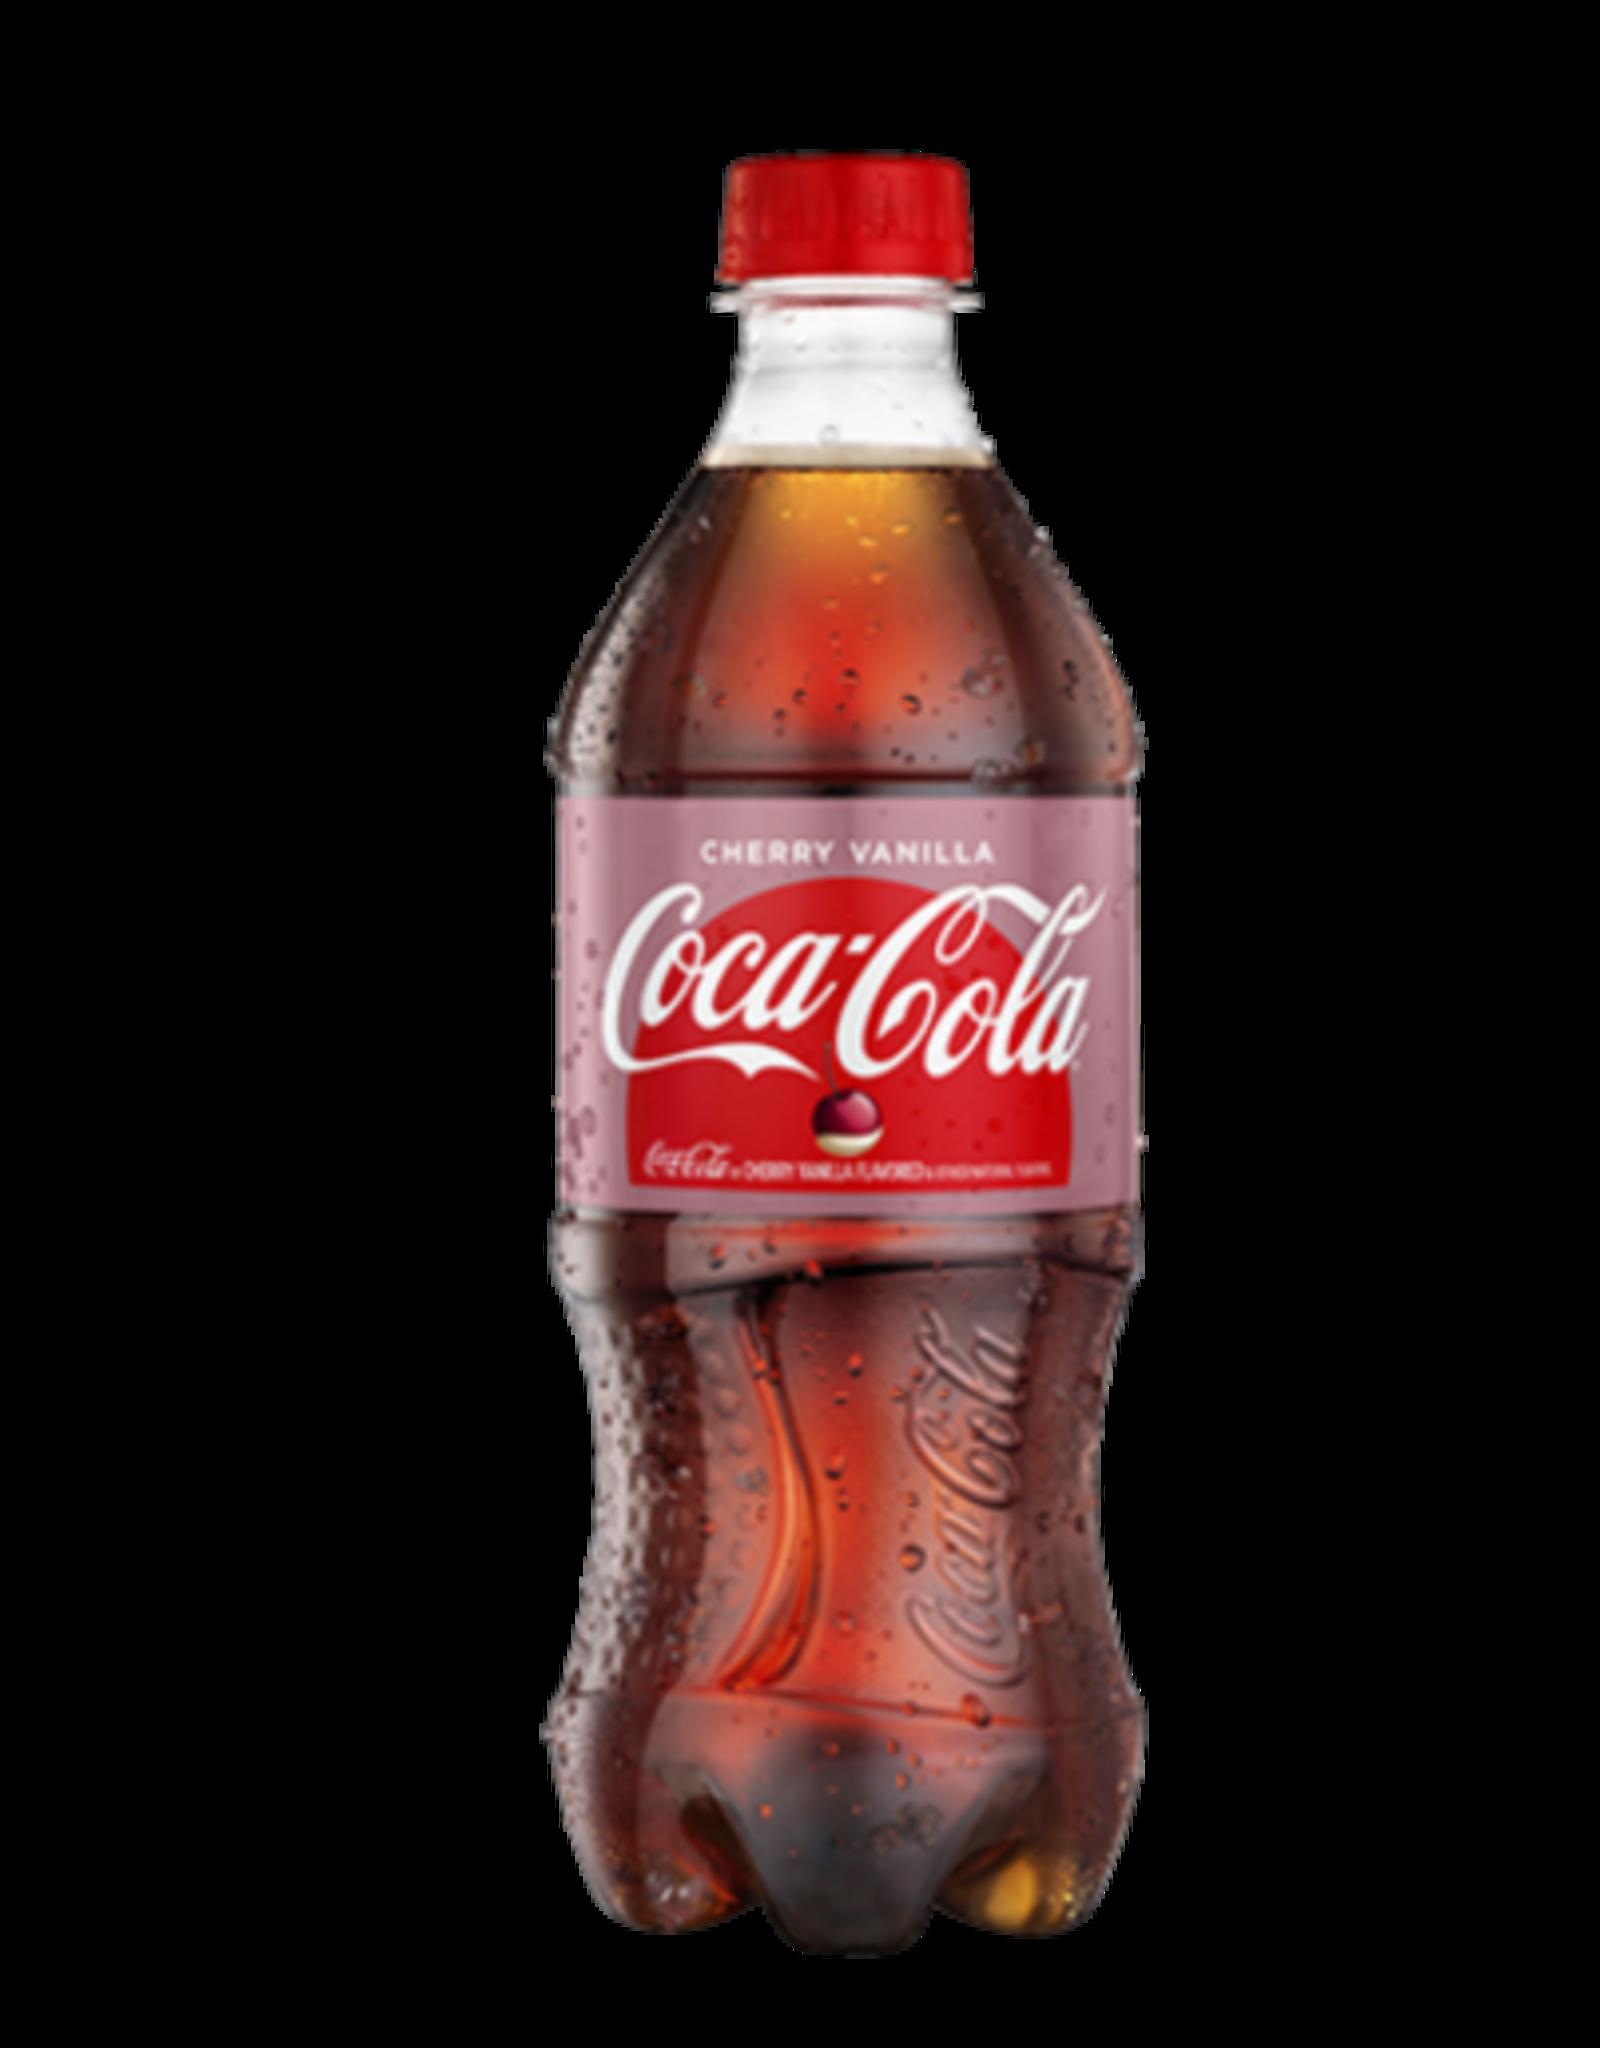 Coca Cola Cherry Vanilla